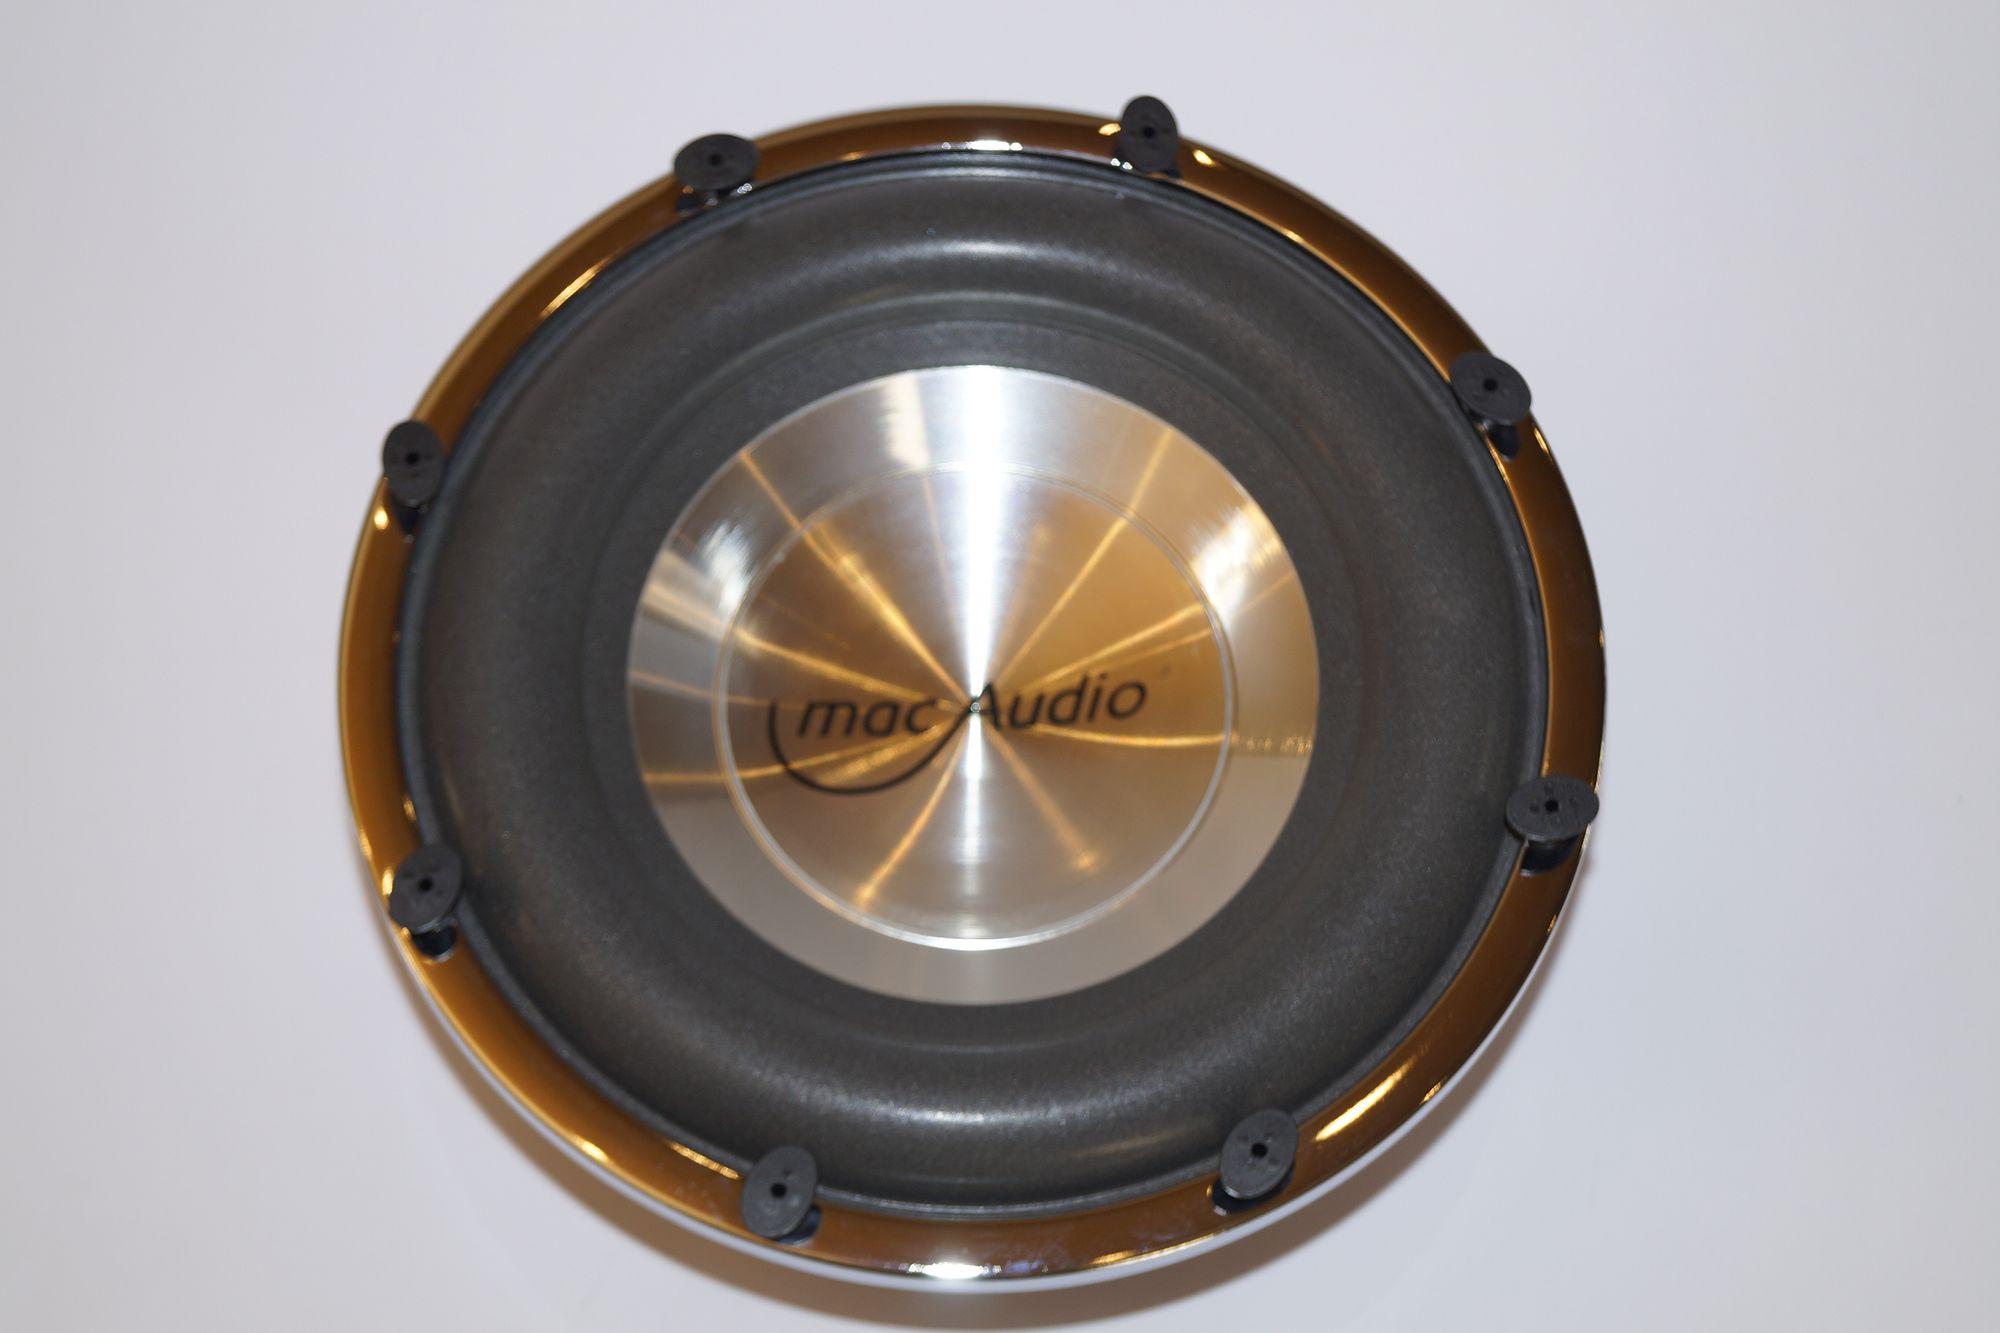 1 Stück Mac Audio ICE FIRE 225 MAWS 250 CPP 2140 IX NL, SERVICEWARE 001